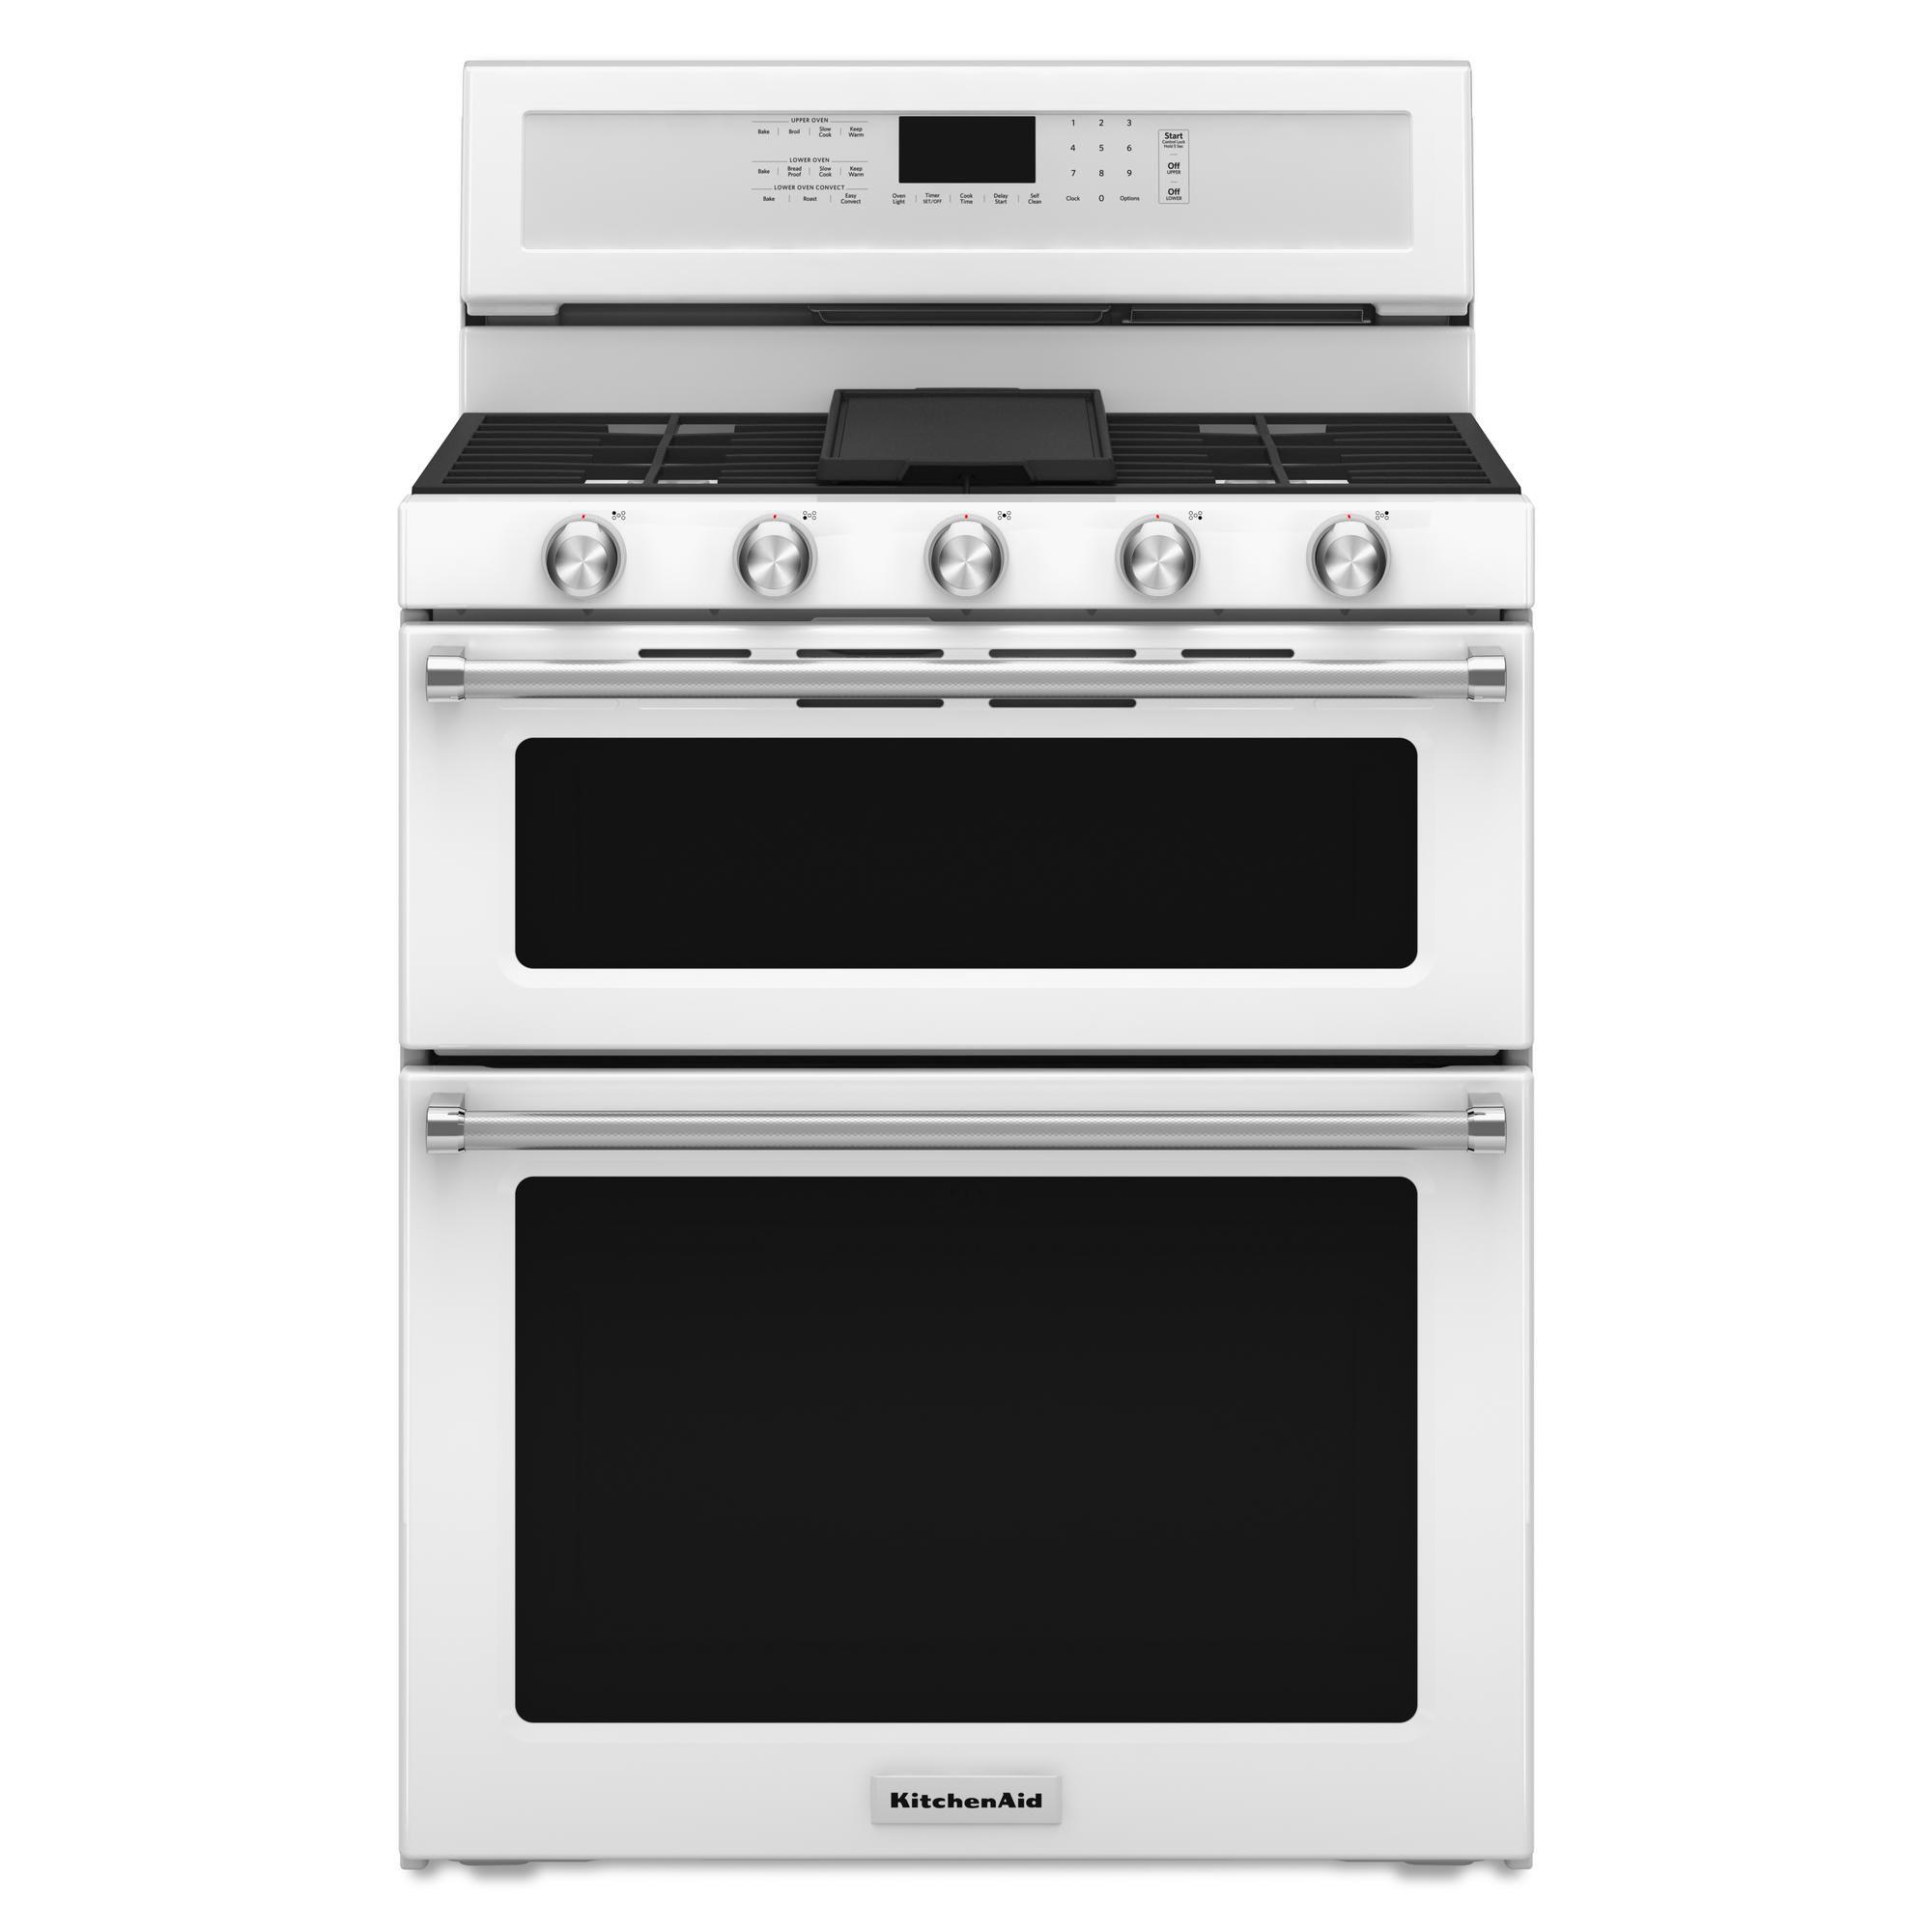 KitchenAid - KFGD500EWH - 6.0 cu. ft. 5-Burner Gas Double ...